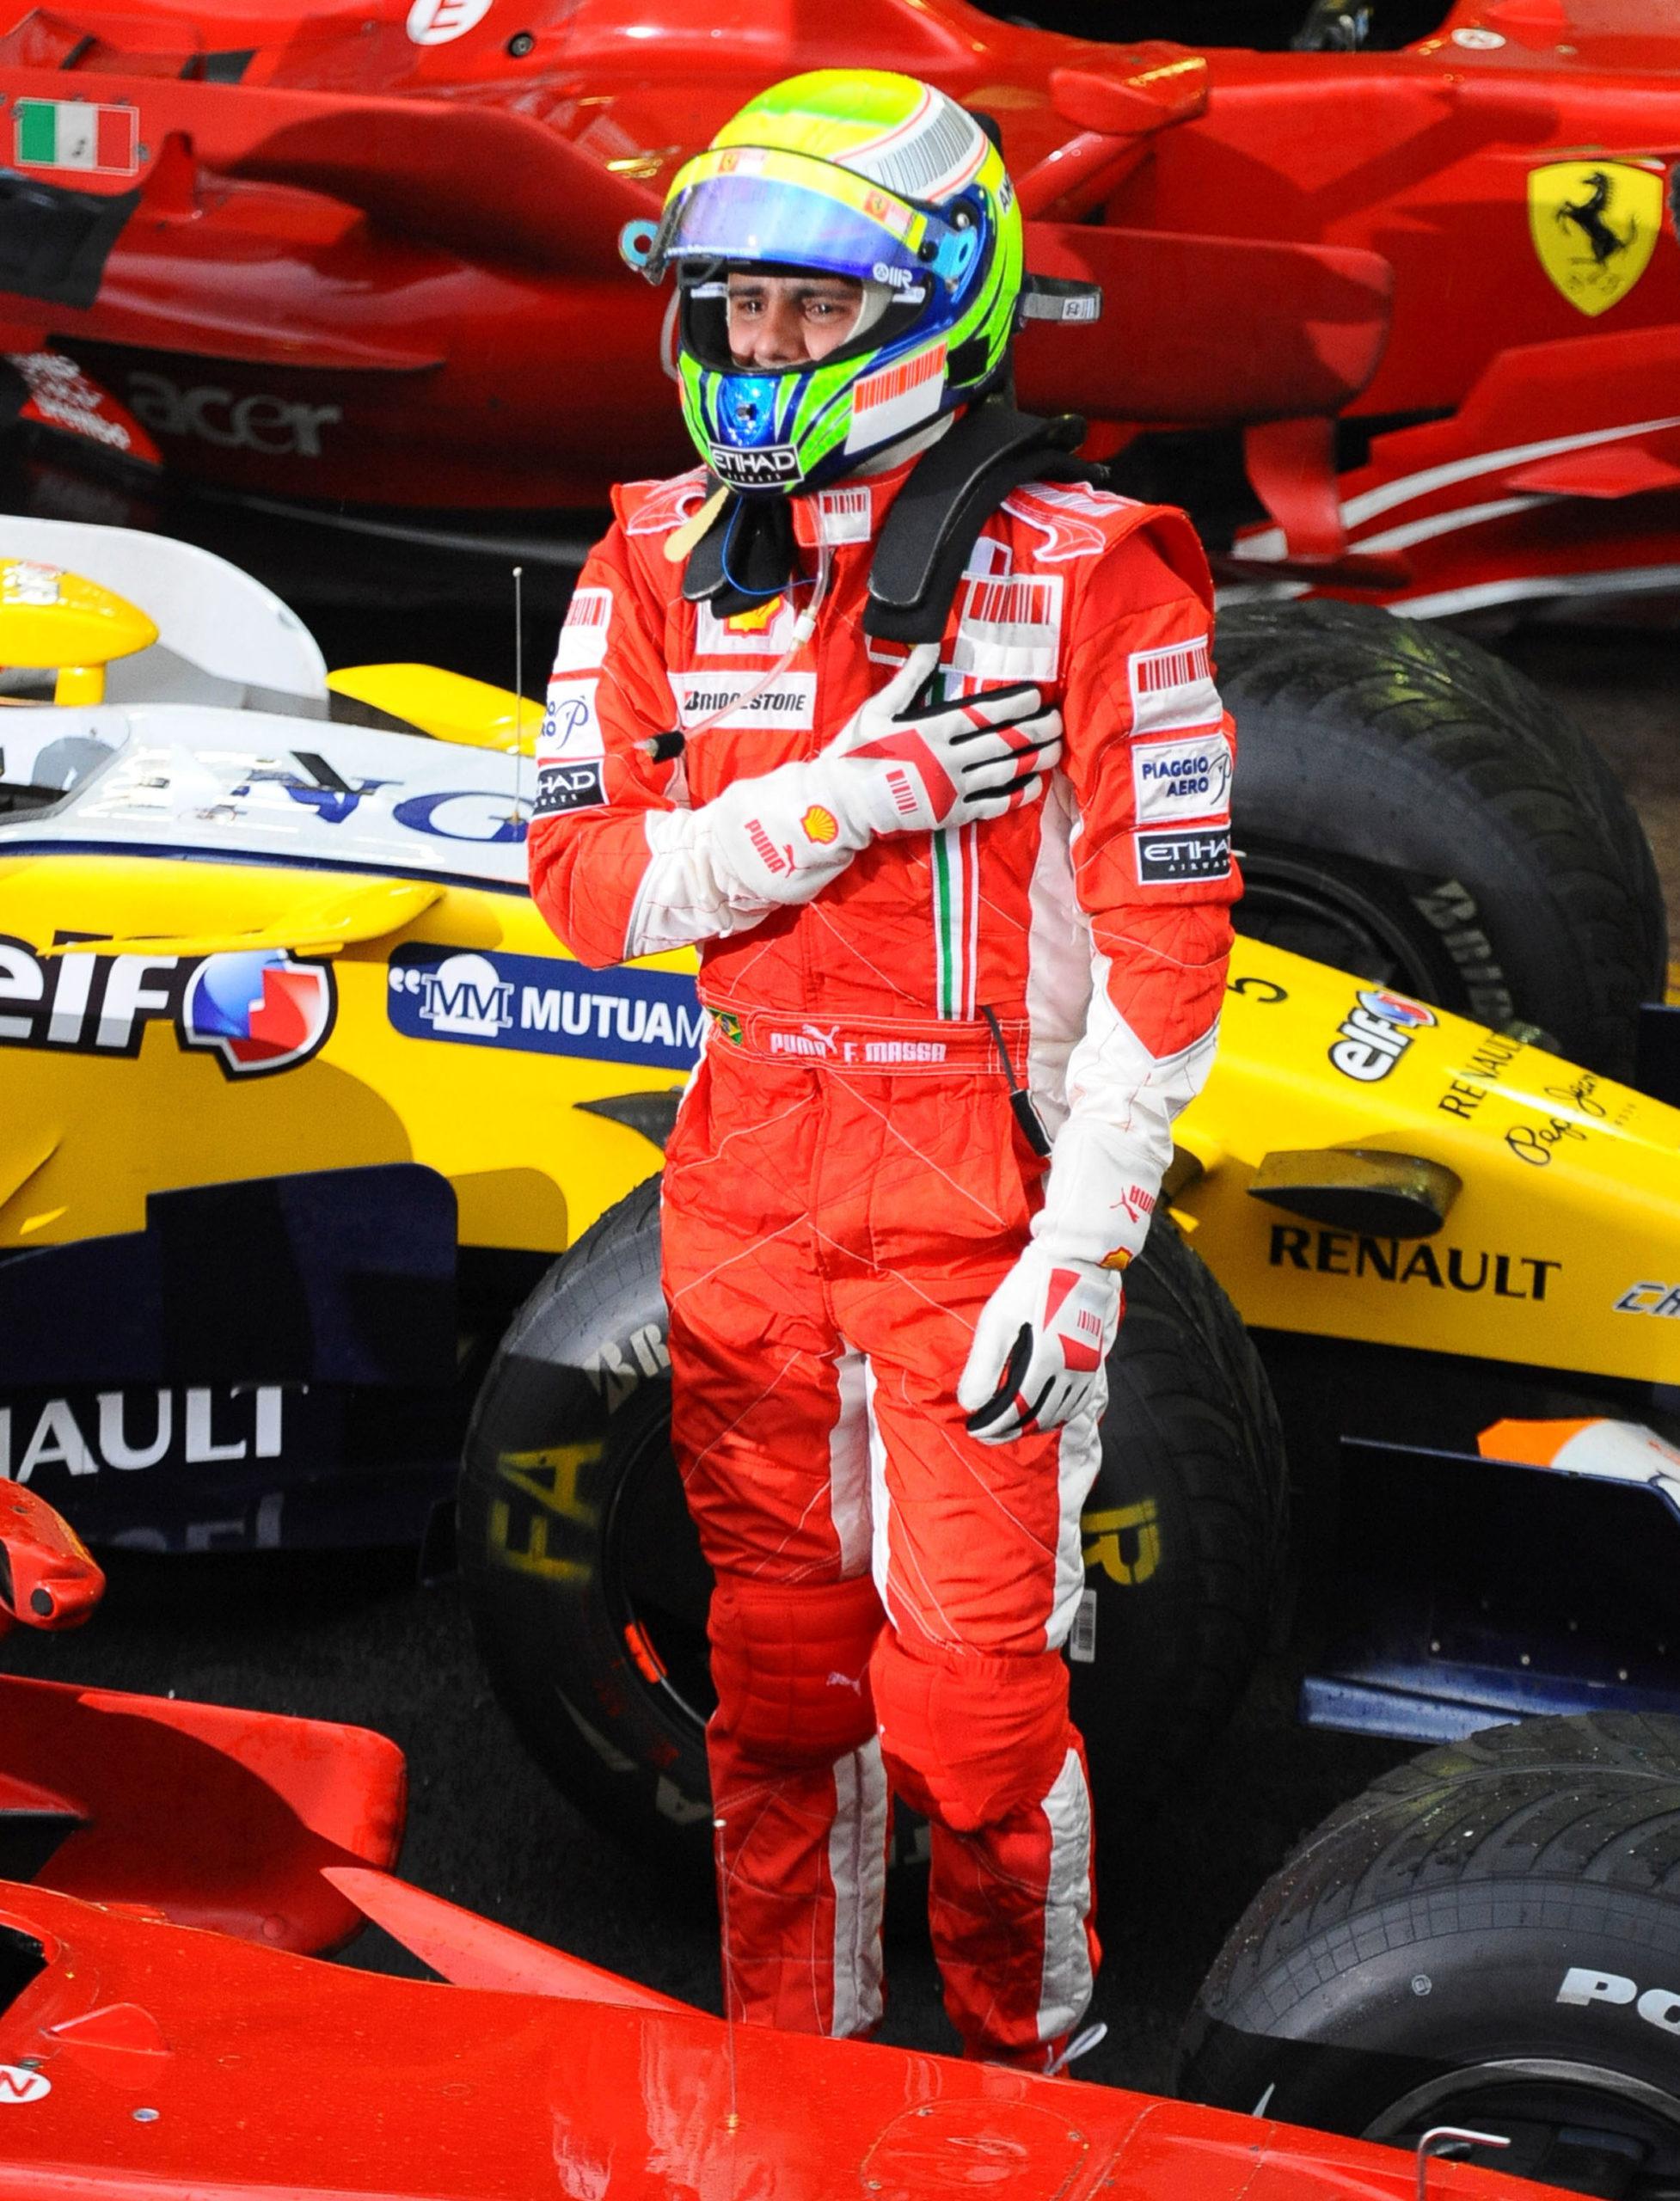 Felipe-Massa-at-the-2008-Brazilian-Grand-Prix